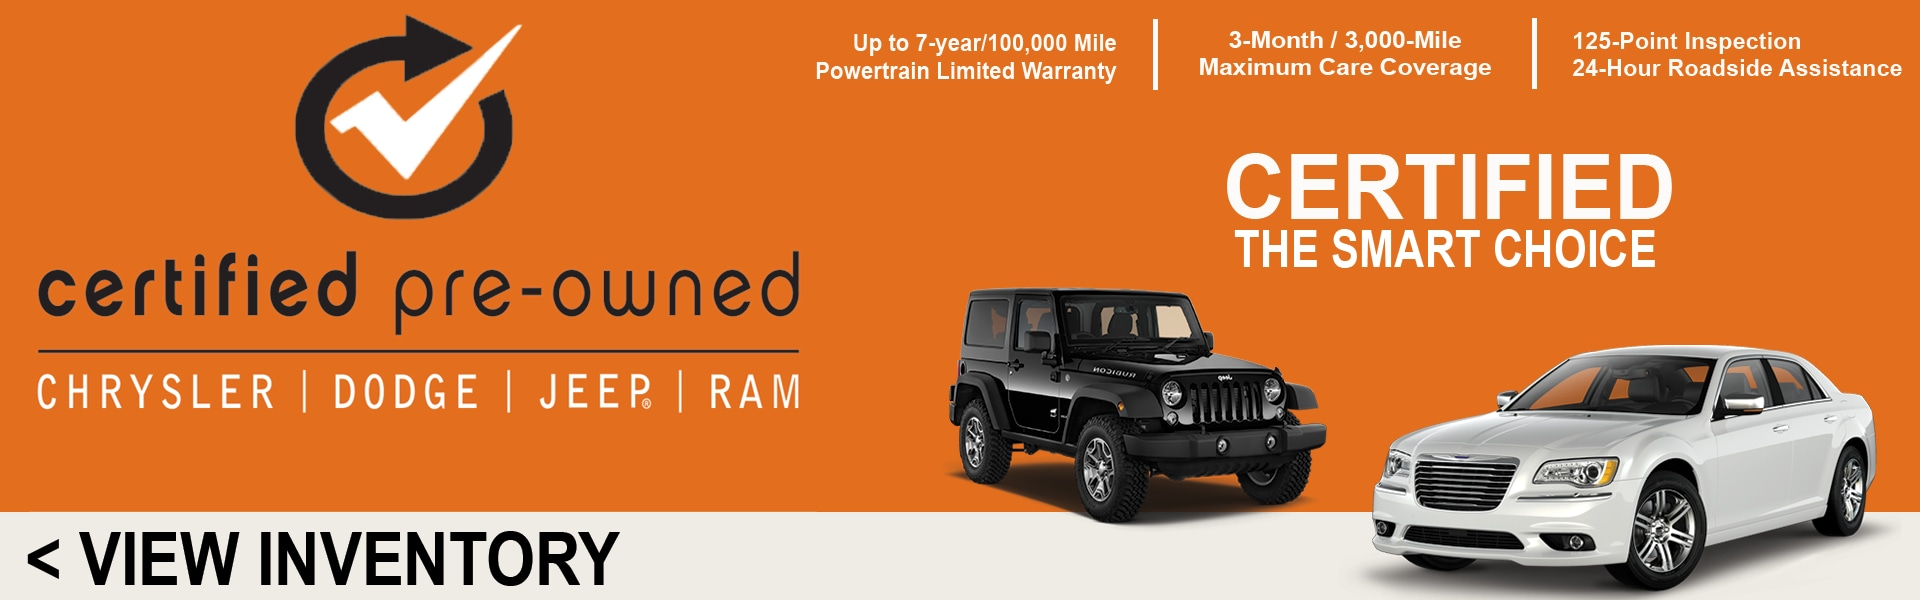 Patterson Chrysler Dodge RAM Jeep | New Chrysler, Dodge, Jeep, Ram ...